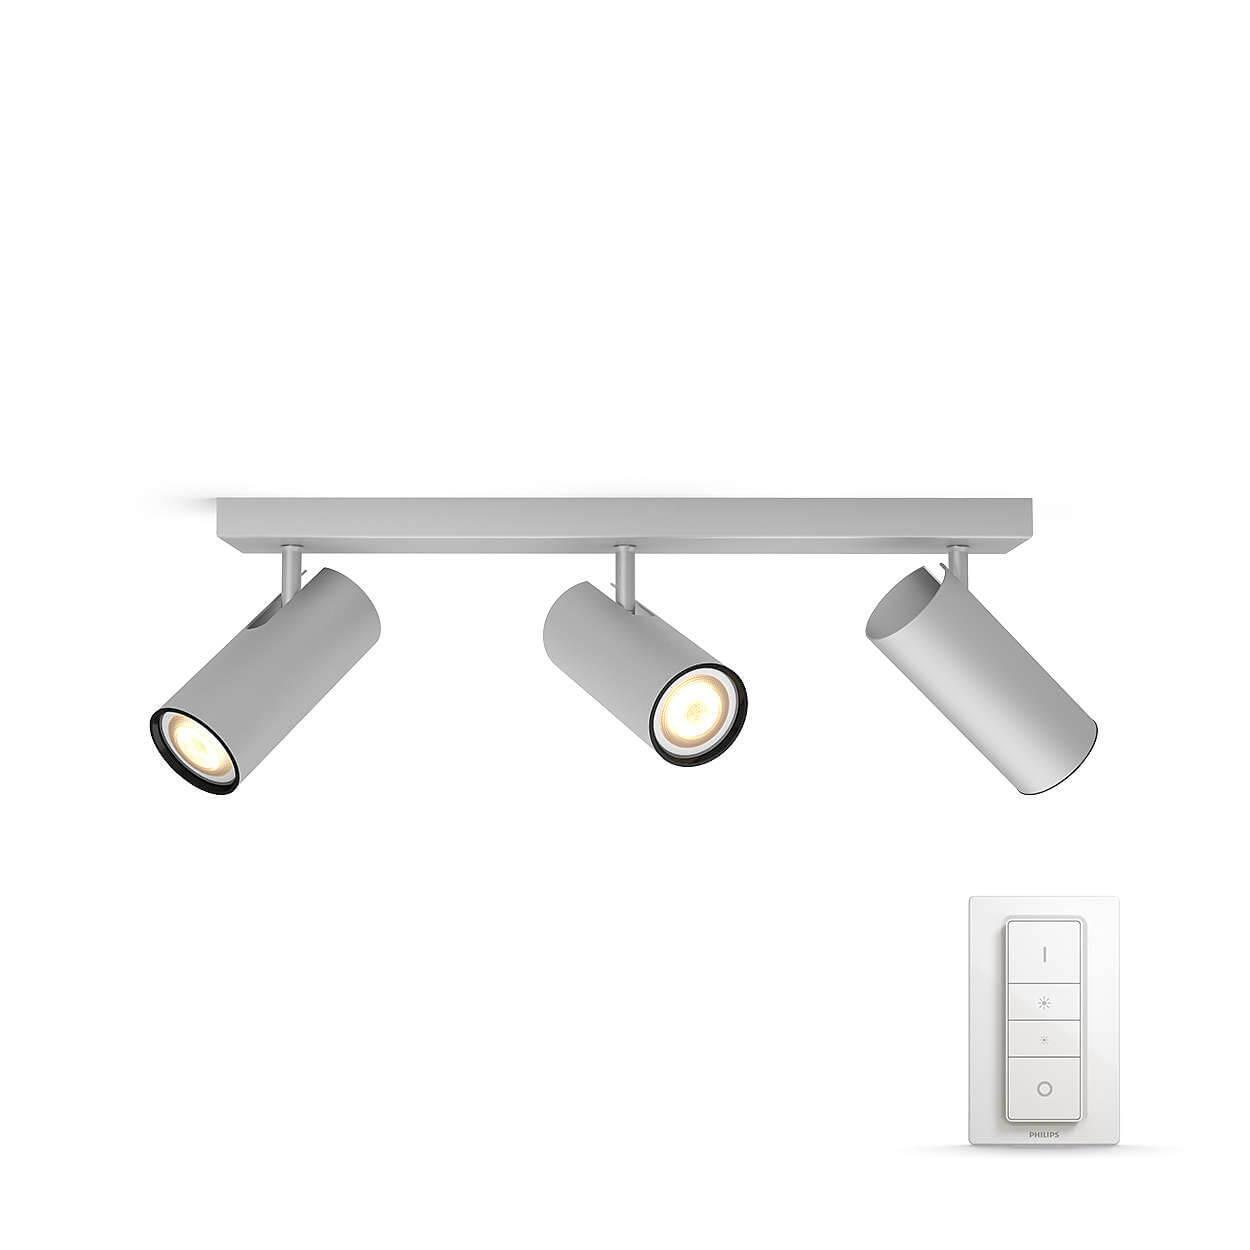 philips hue buratto aluminium 3 spot incl dimswitch. Black Bedroom Furniture Sets. Home Design Ideas